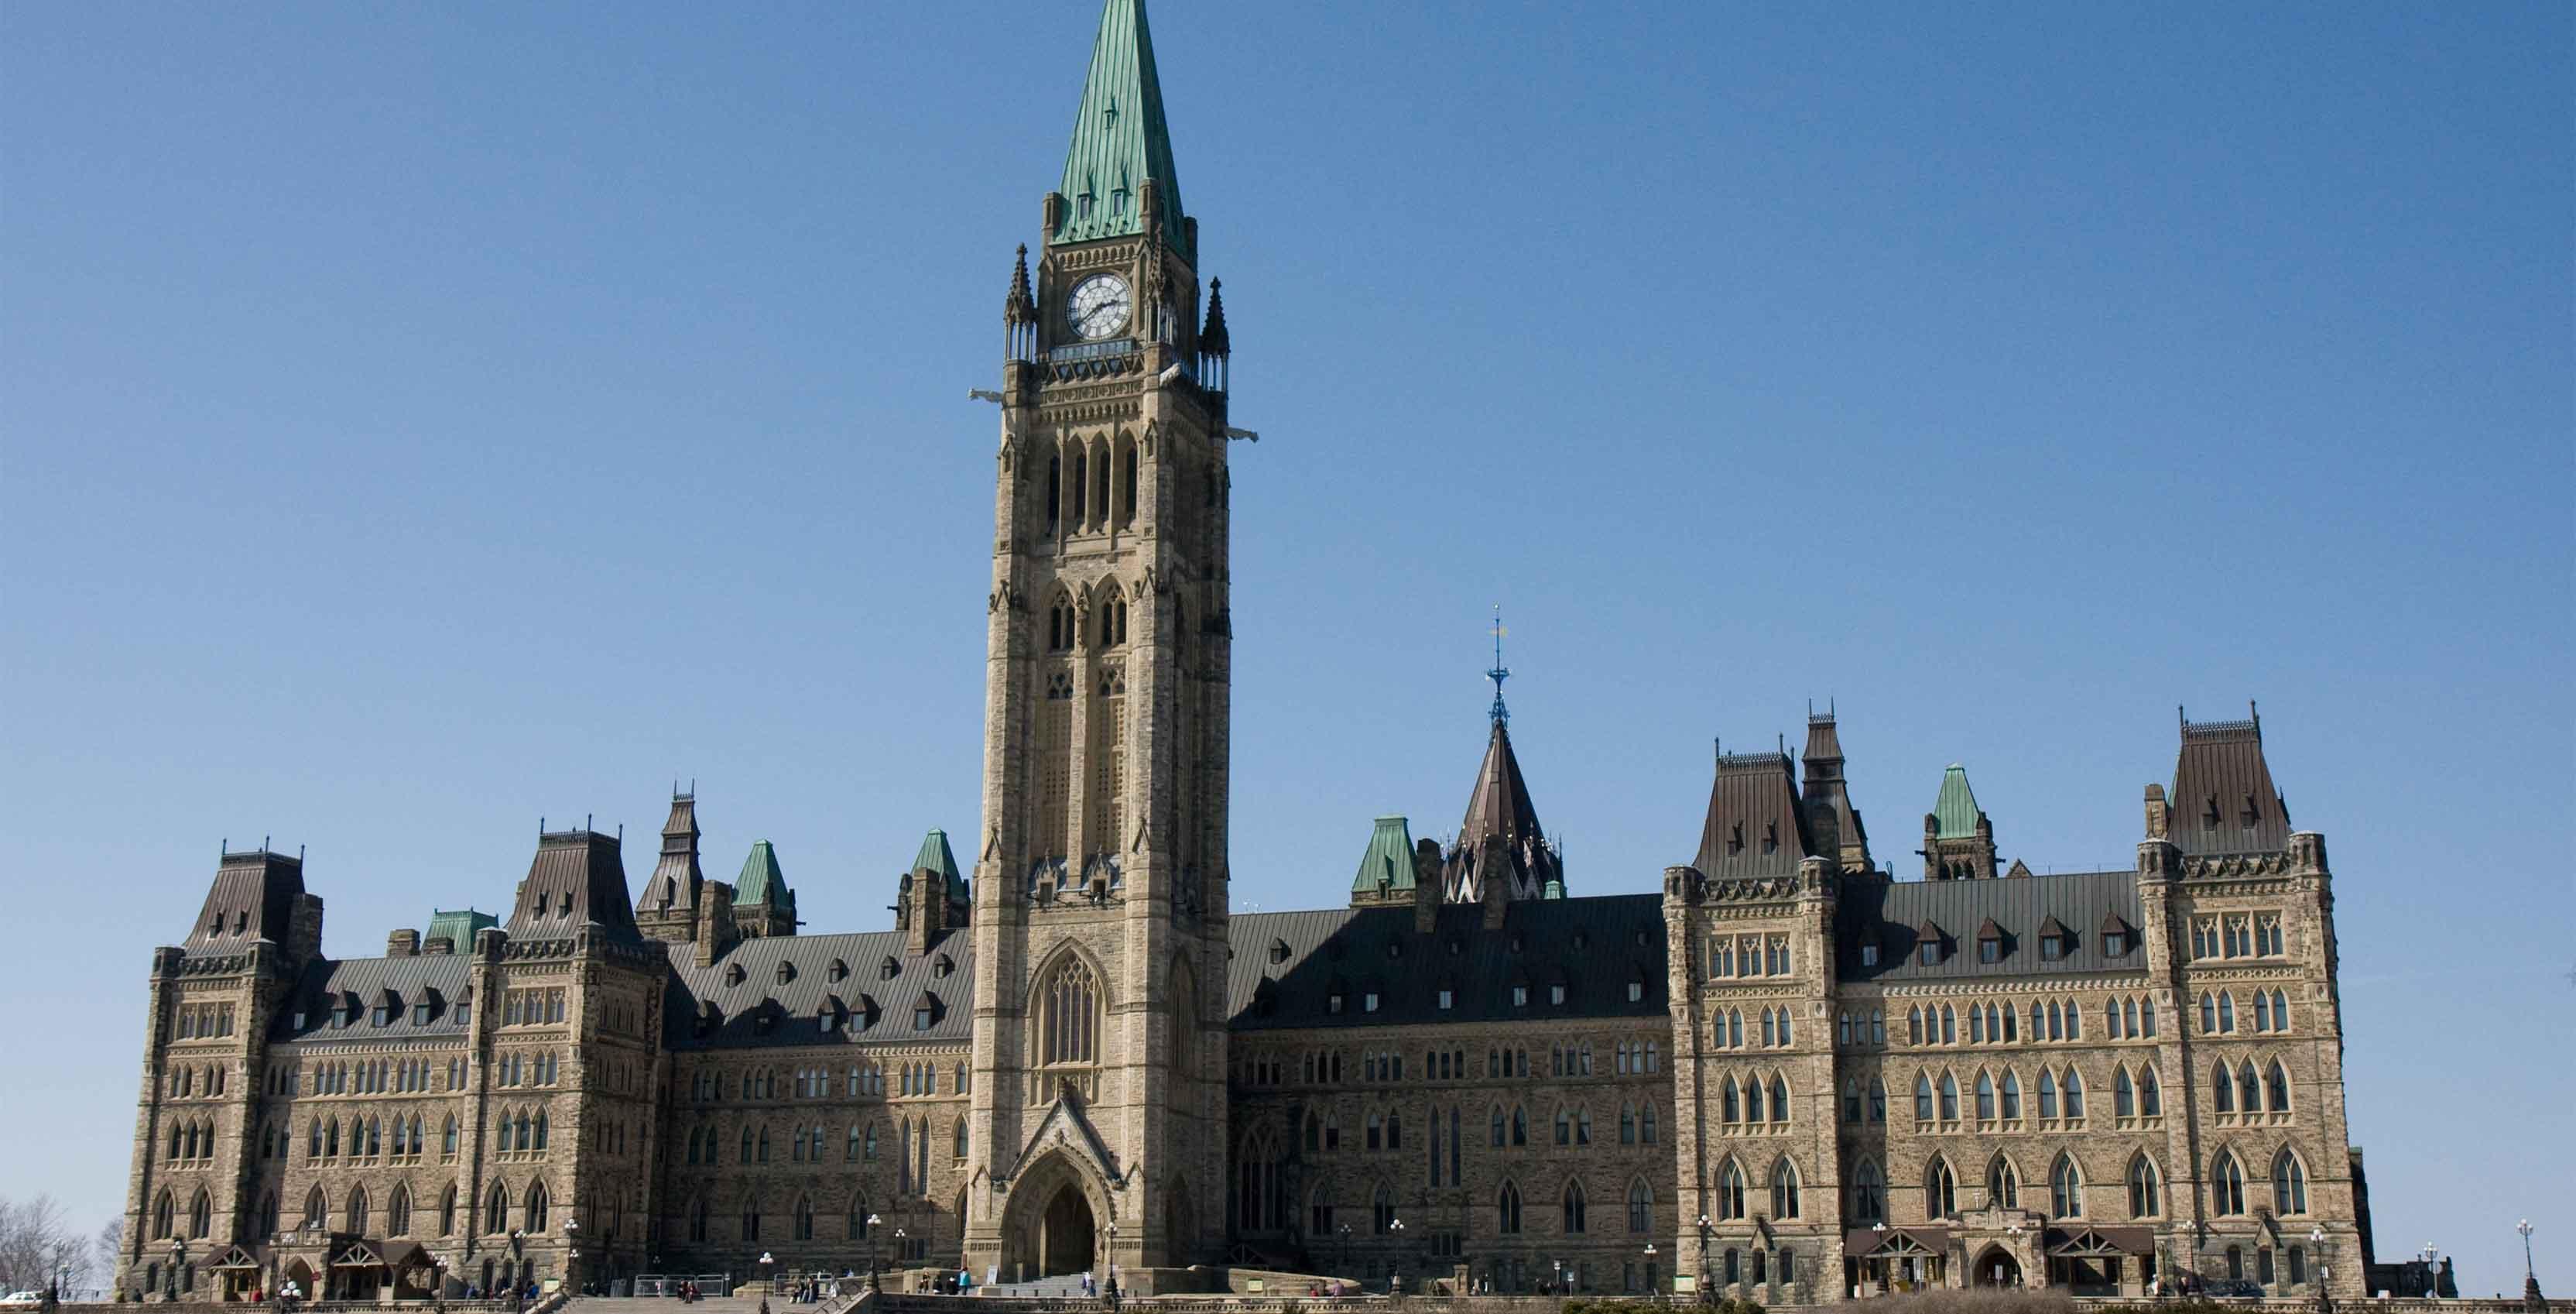 Canadian parliament - CSIS